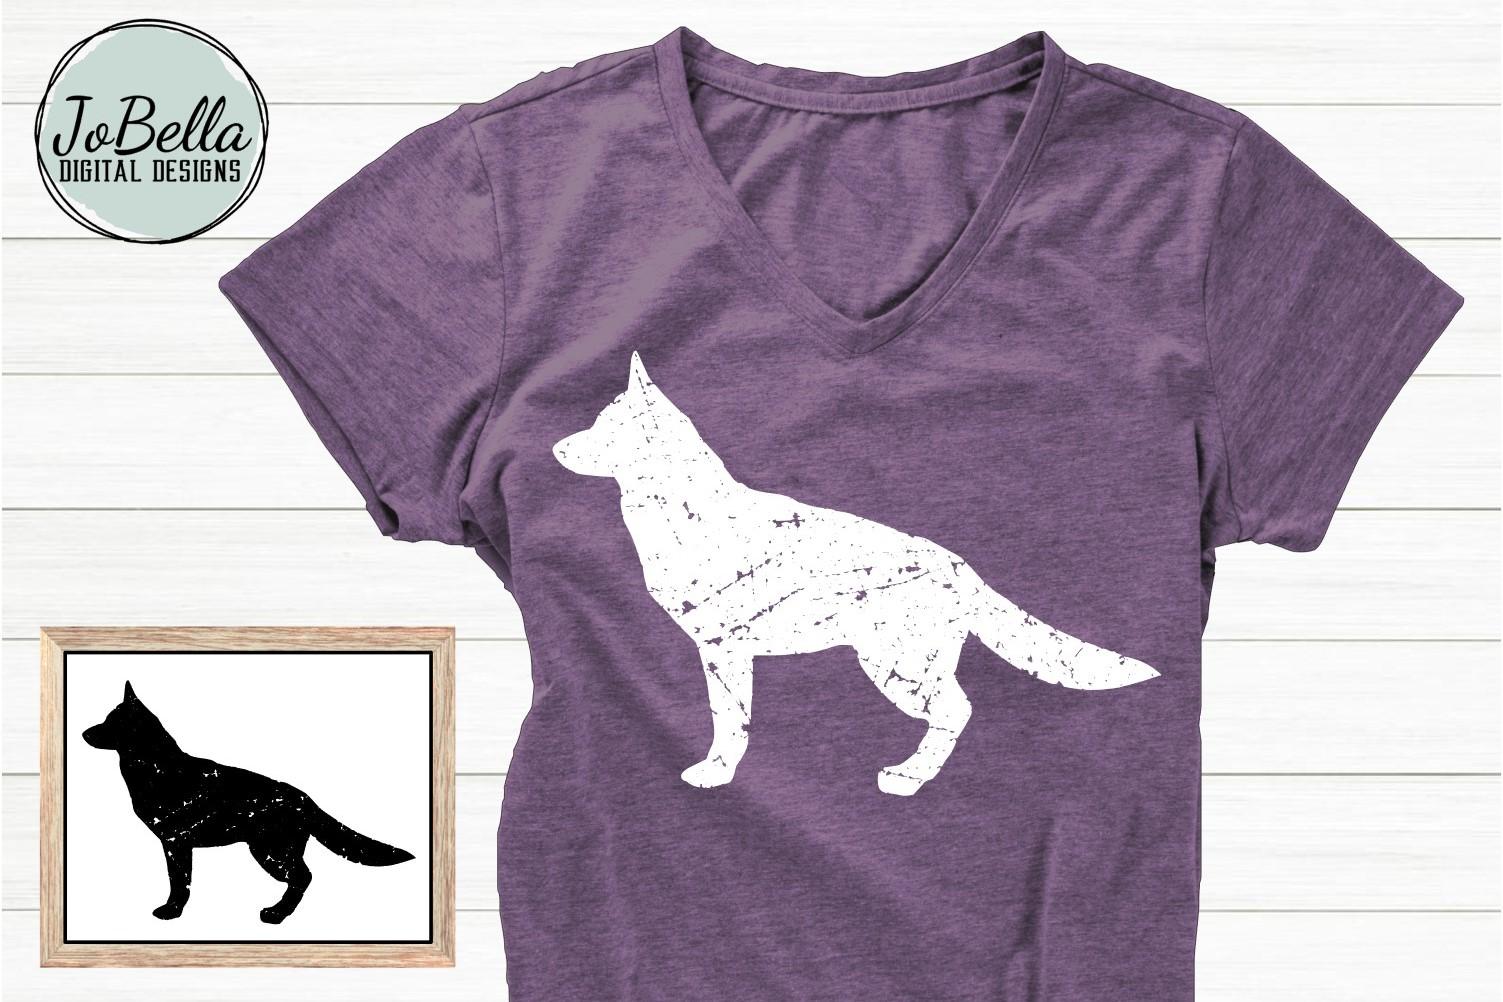 Distressed Dogs Bundle - Popular Dog Breed Grunge Designs example image 8